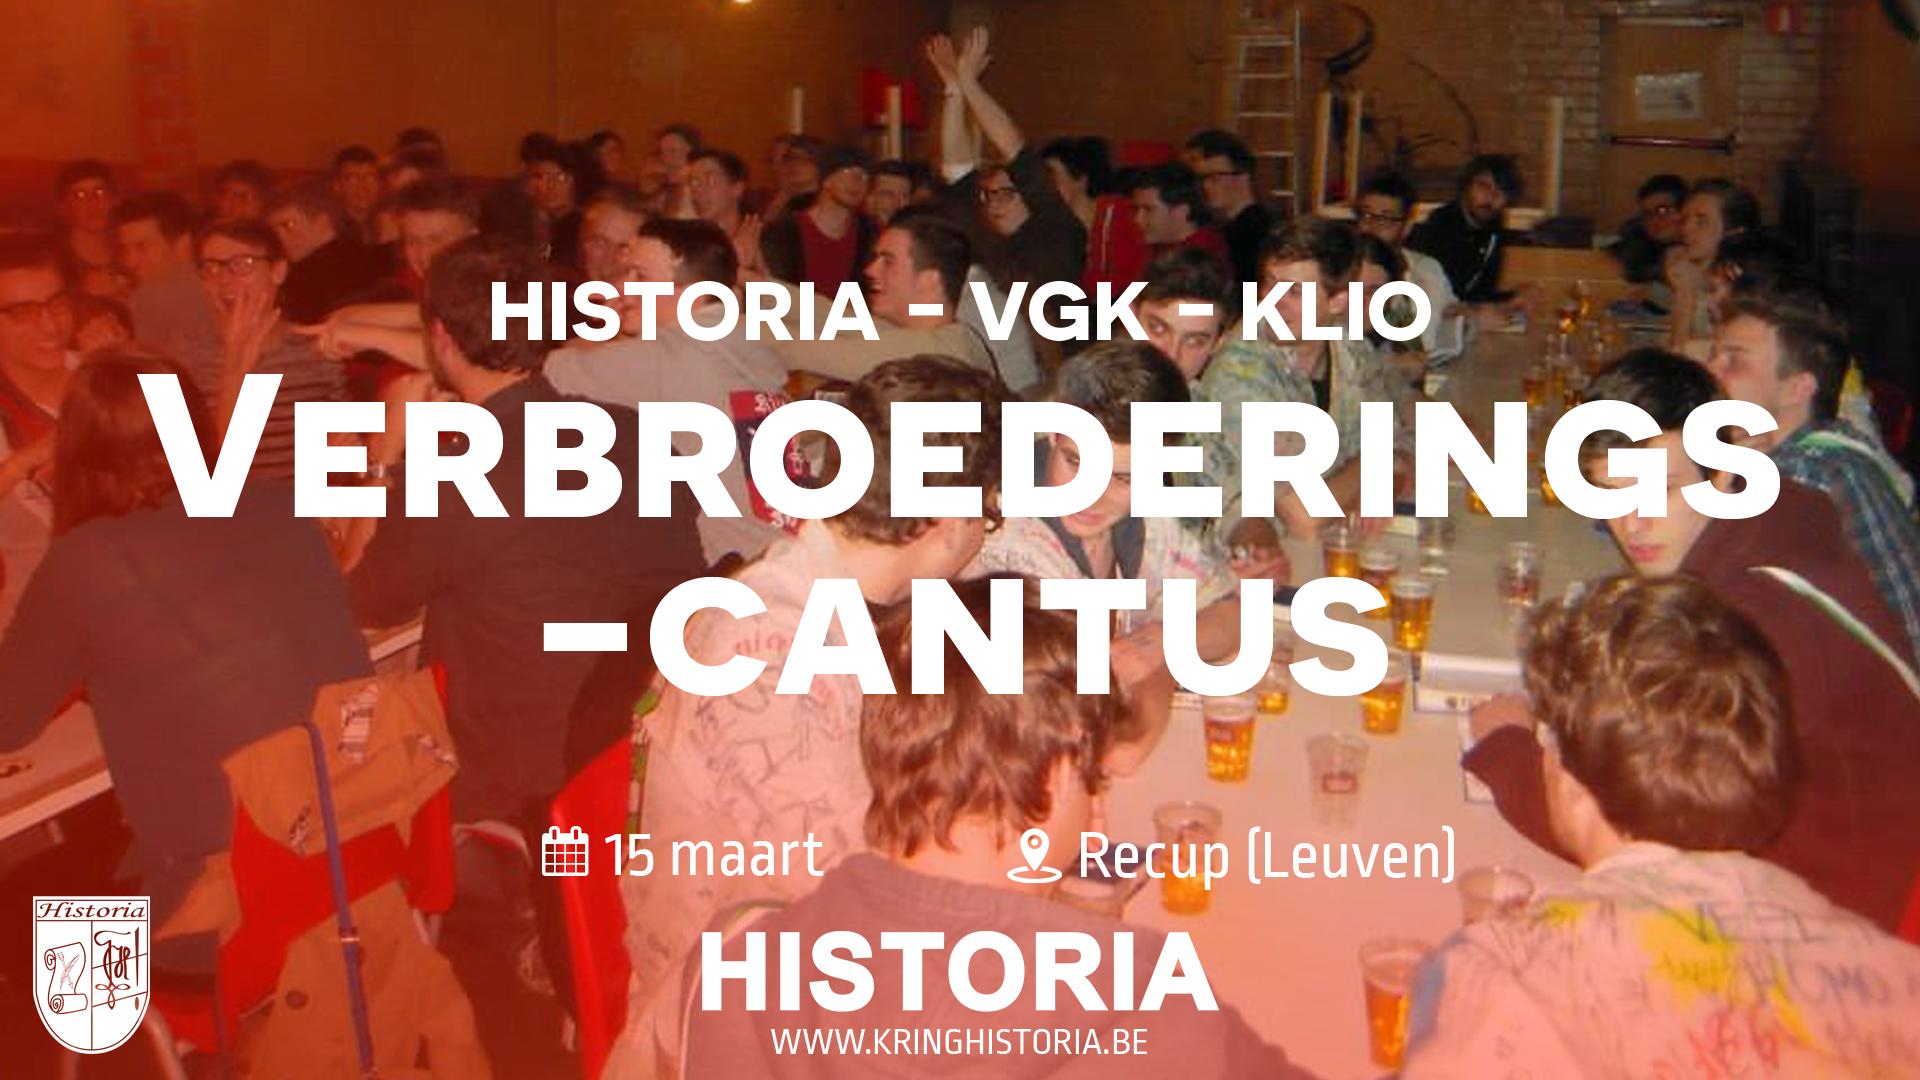 Verbroederingscantus HISTORIA - VGK - KLIO